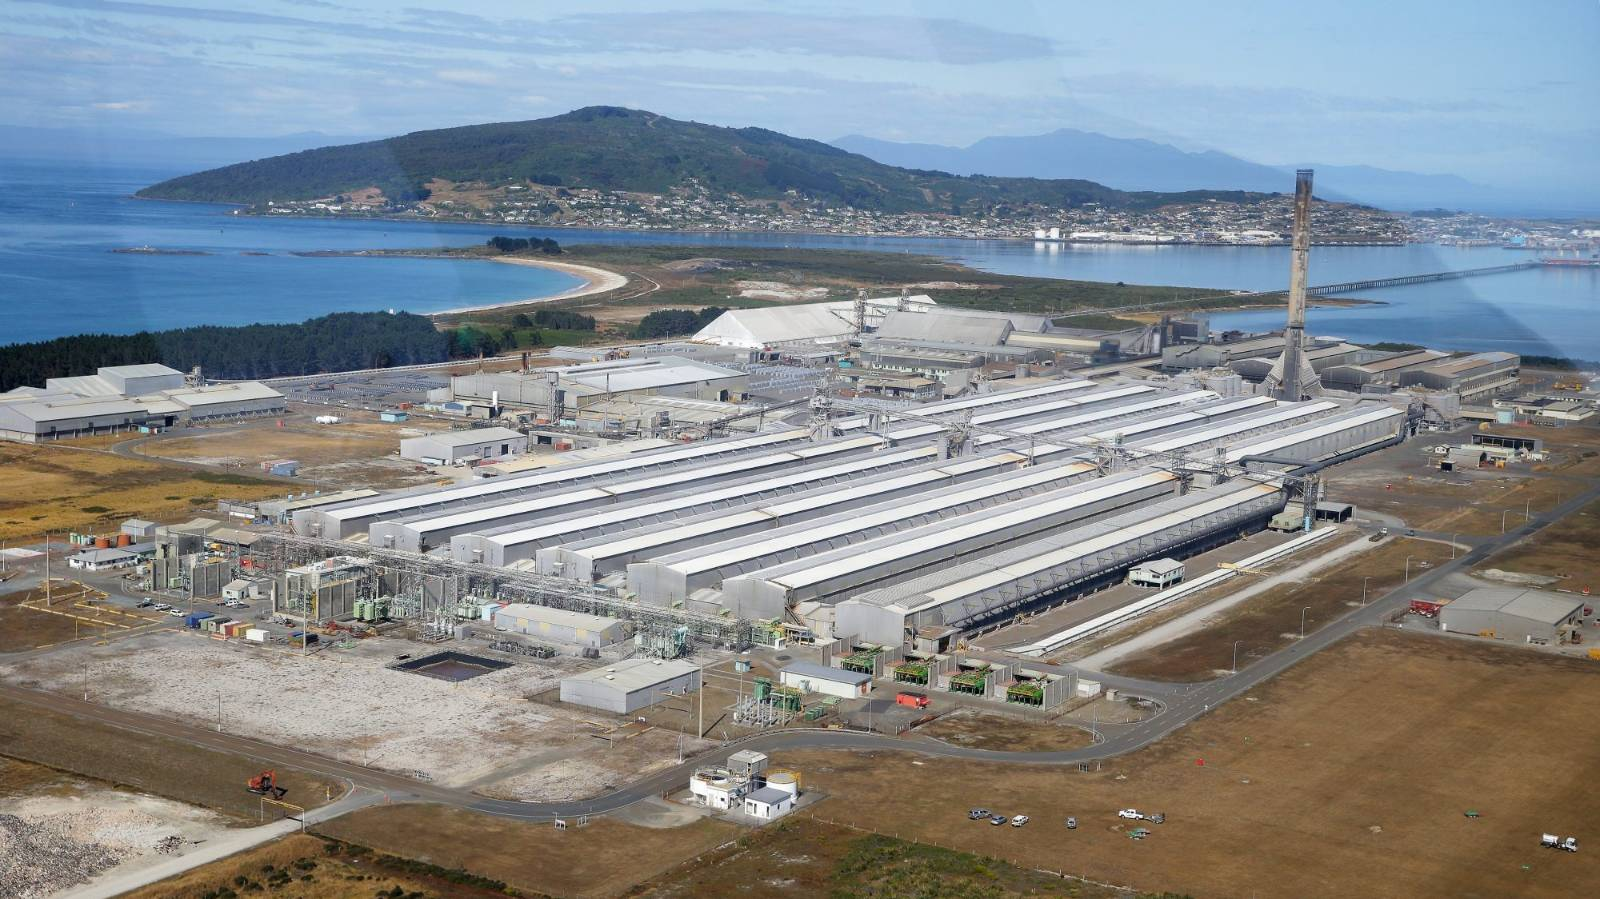 Tiwai Point aluminium smelter to close, 1000 jobs to go